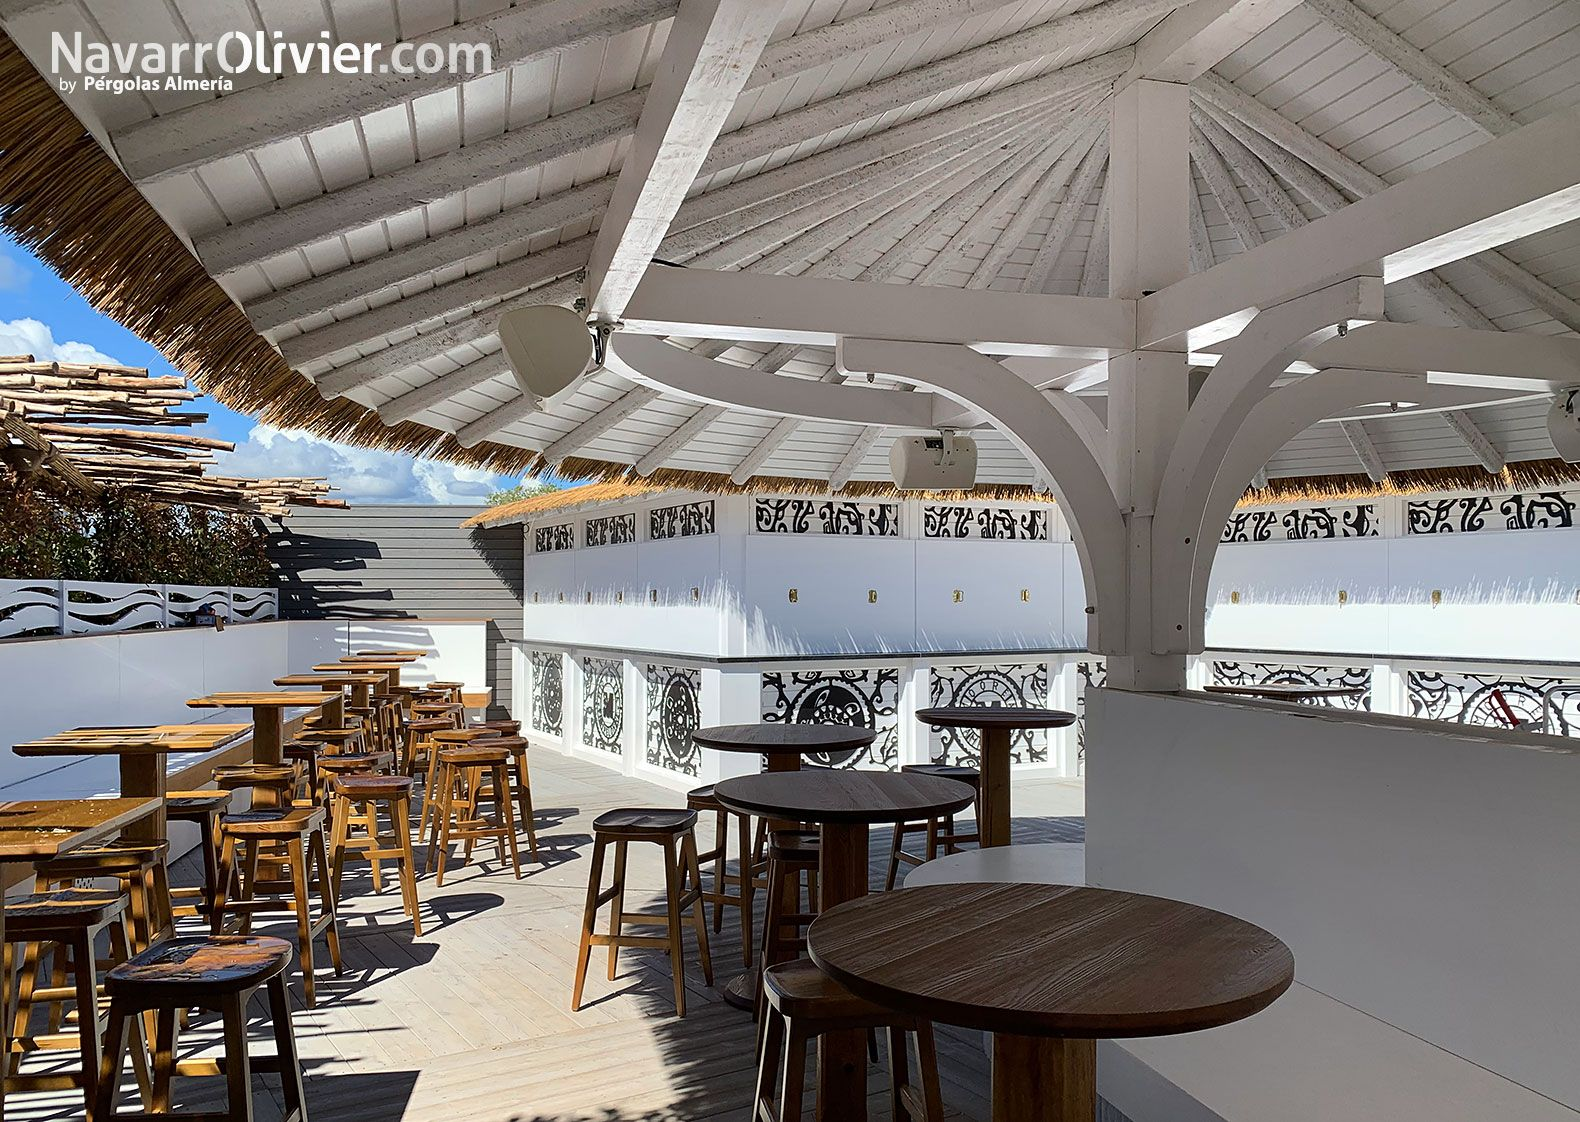 Moorea Beach Club Pampelonne Saint Tropez Madera Para Exterior Construccion En Madera Terraza